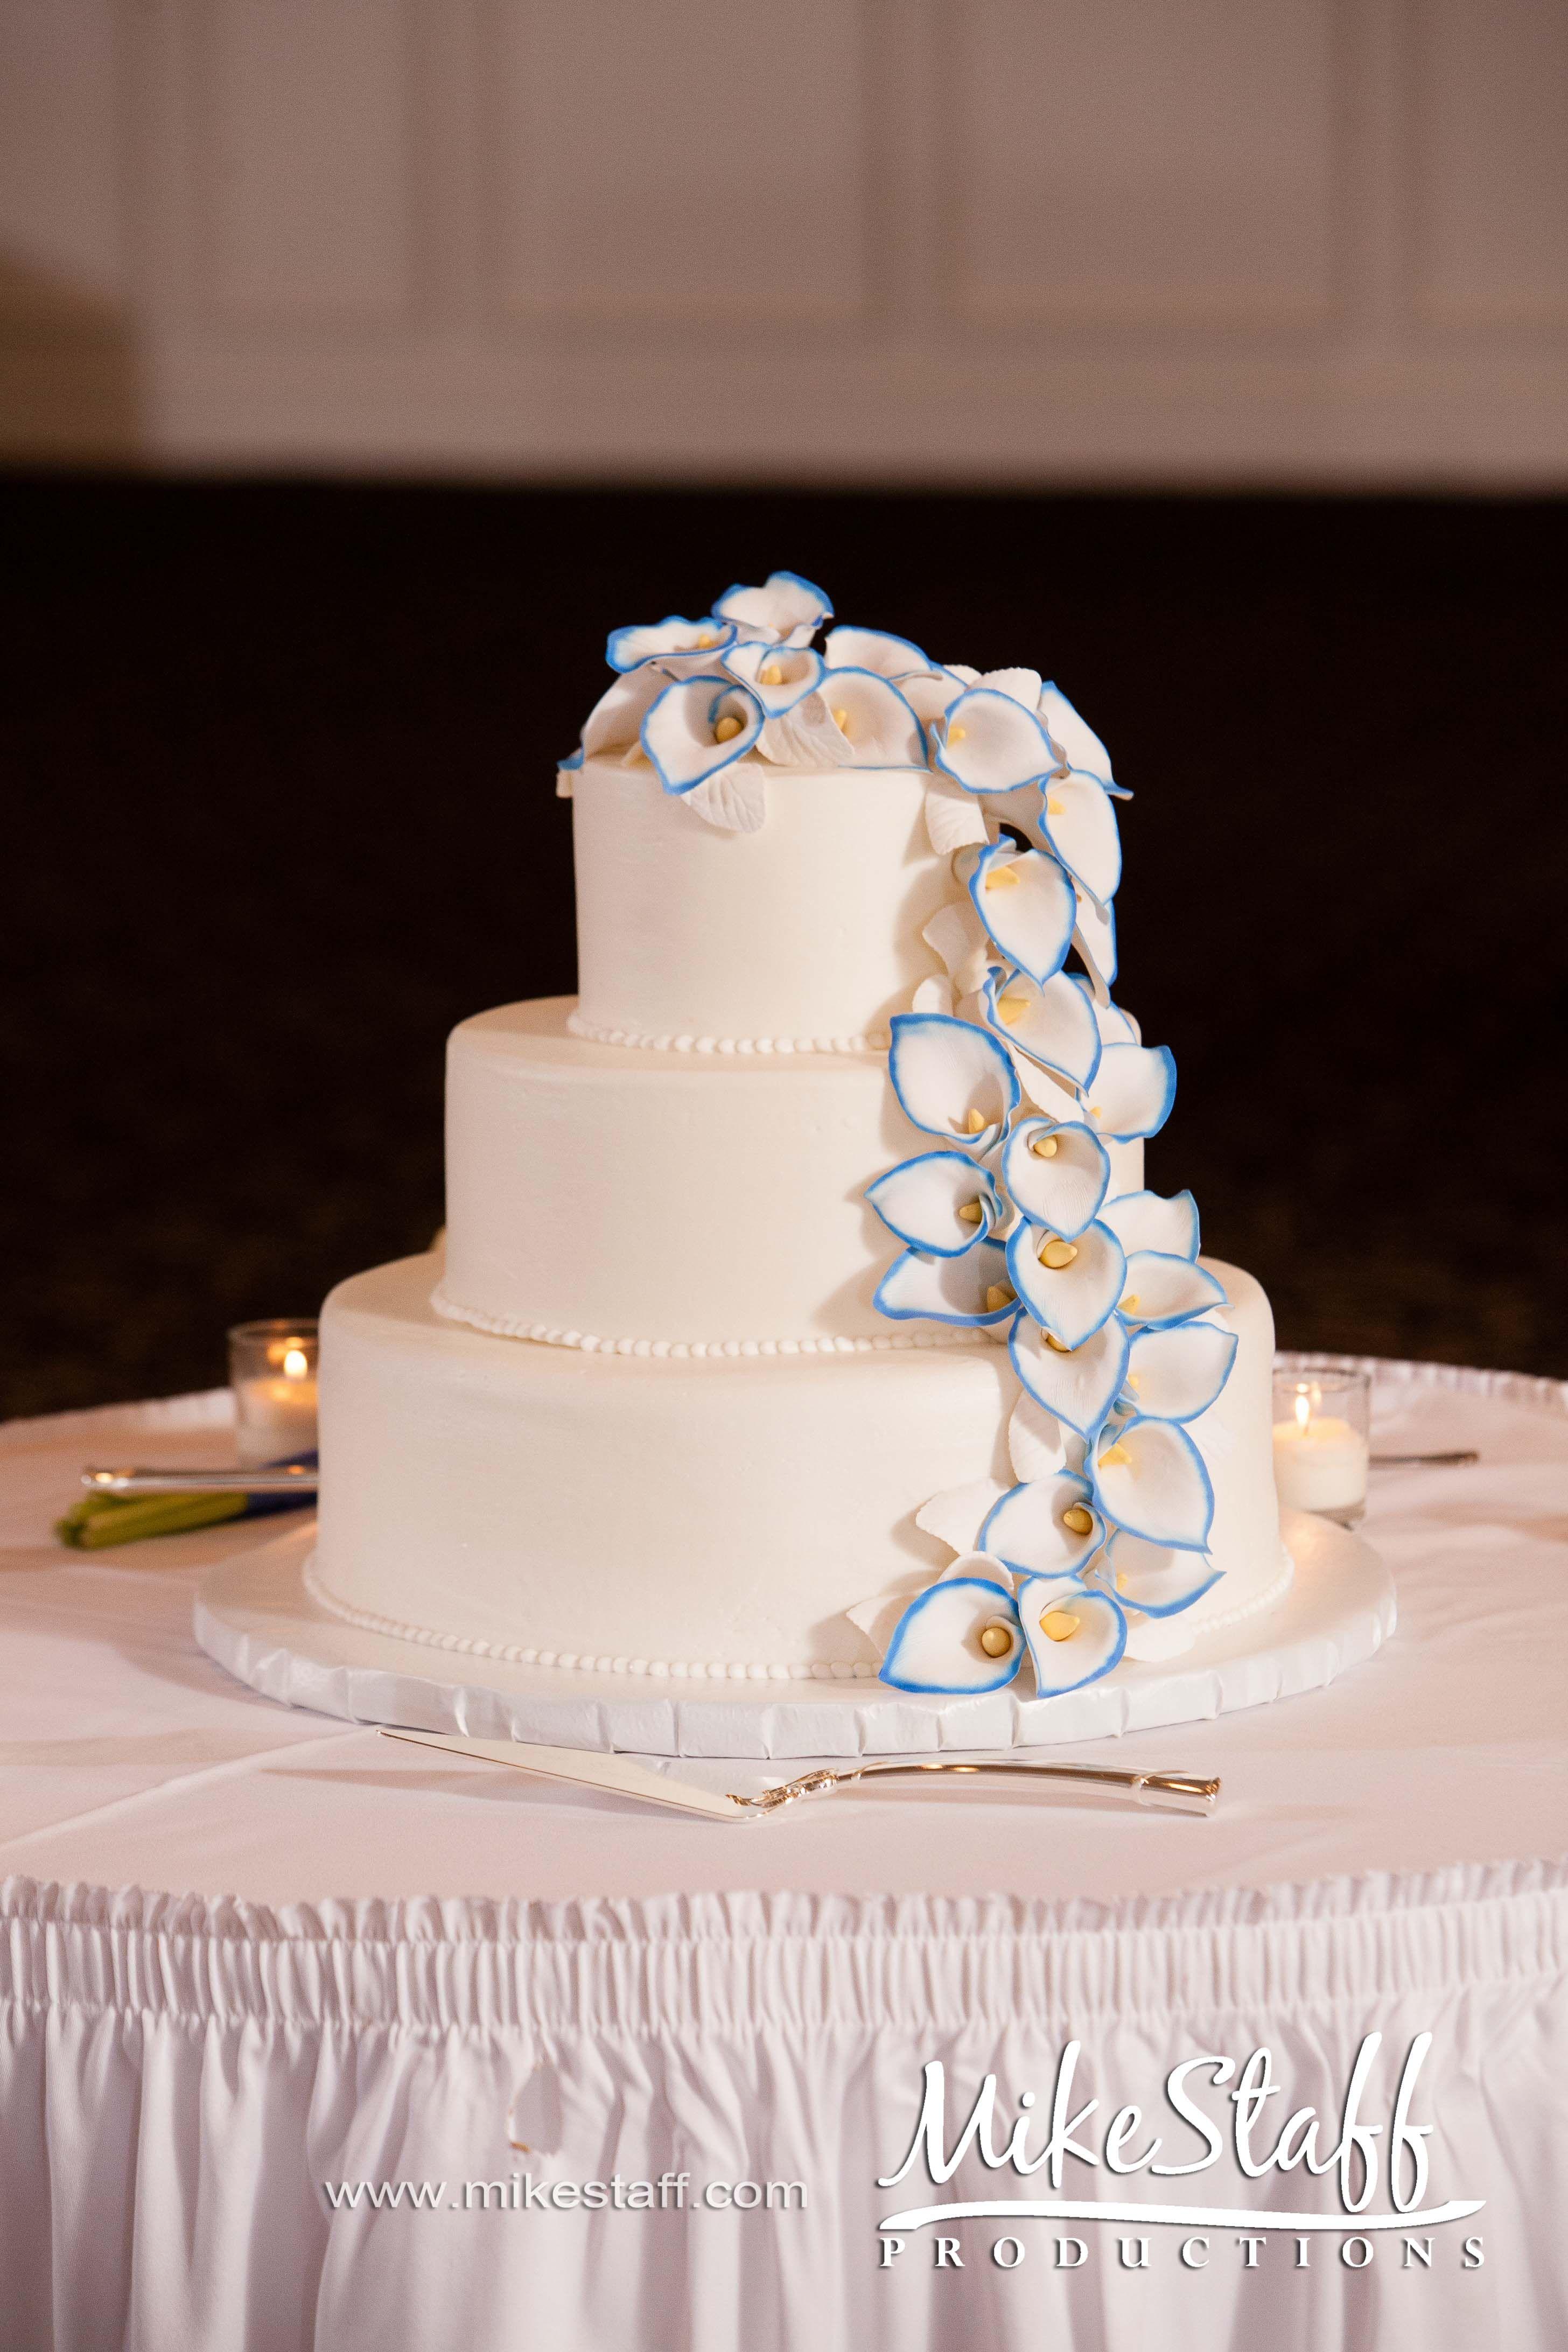 Wedding cake michigan wedding chicago wedding mike staff